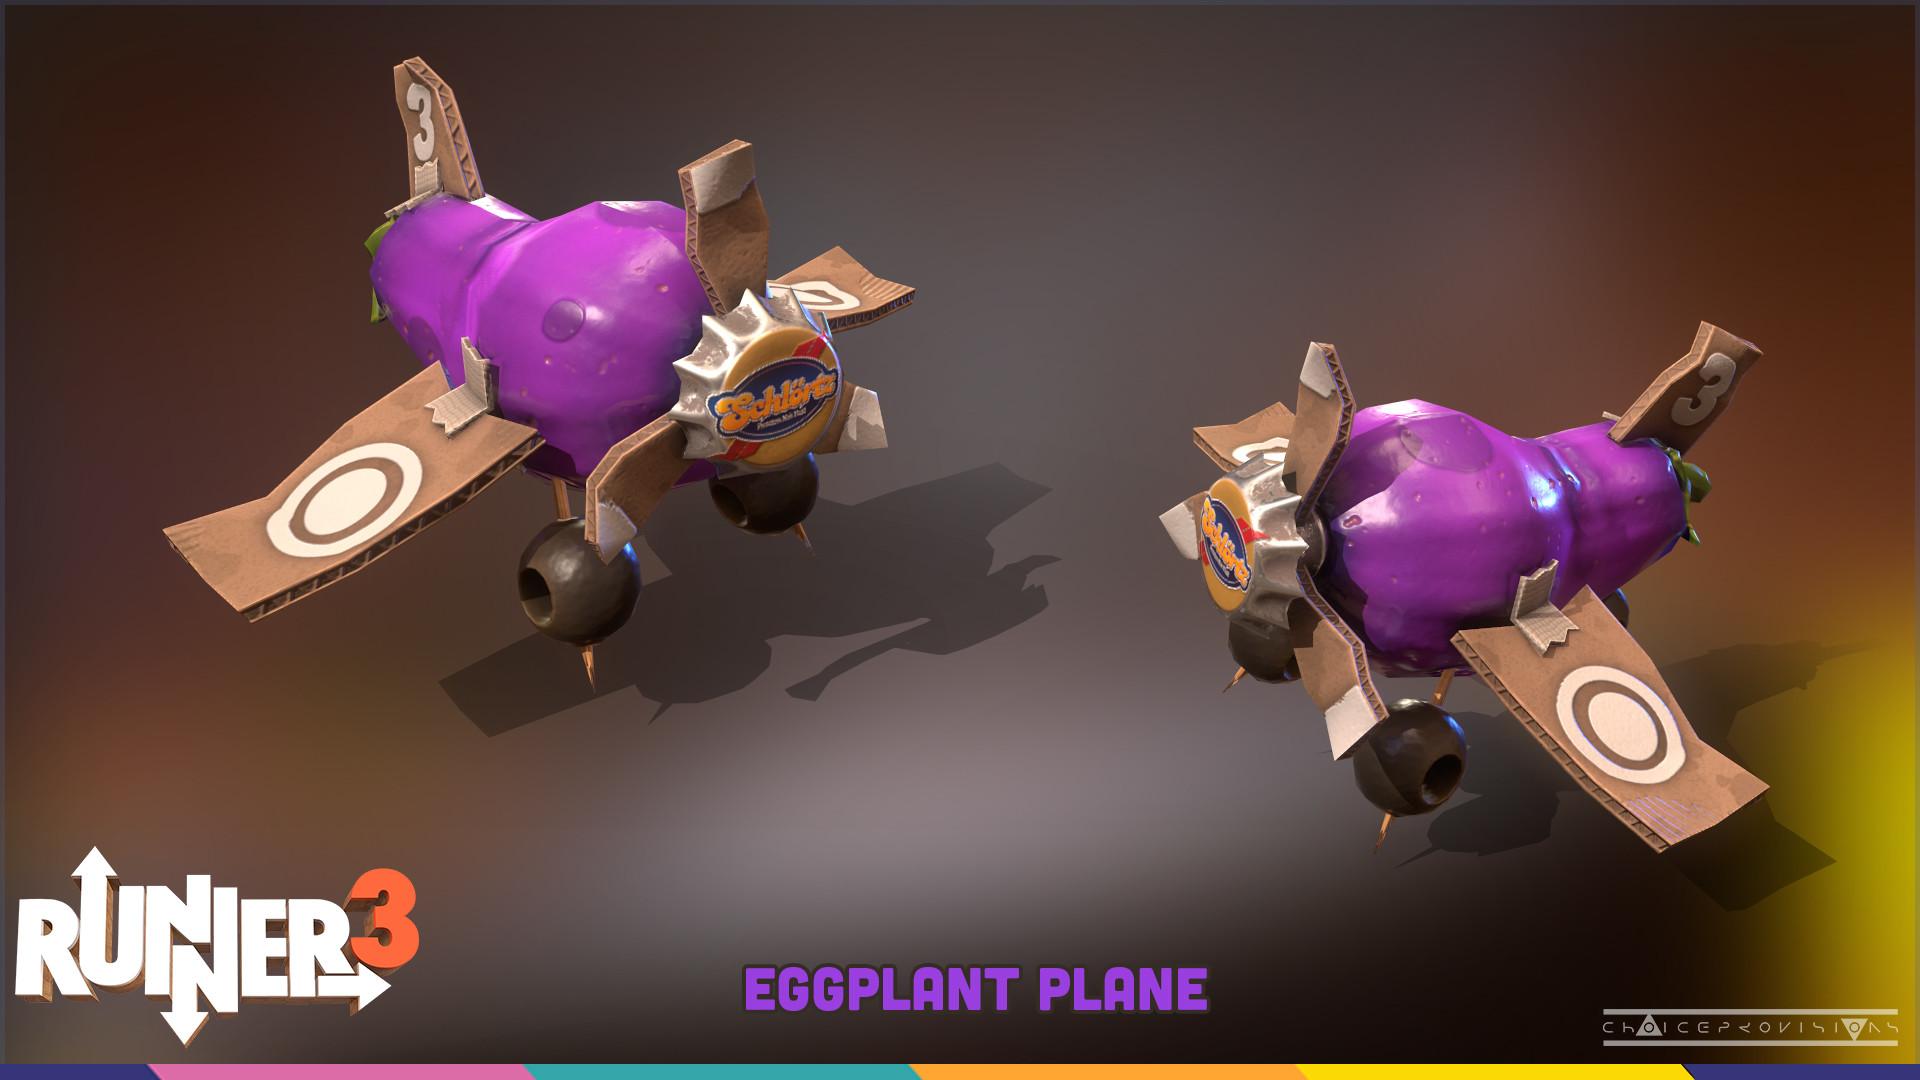 josh-defries-screenshot-eggplant-plane-01.jpg